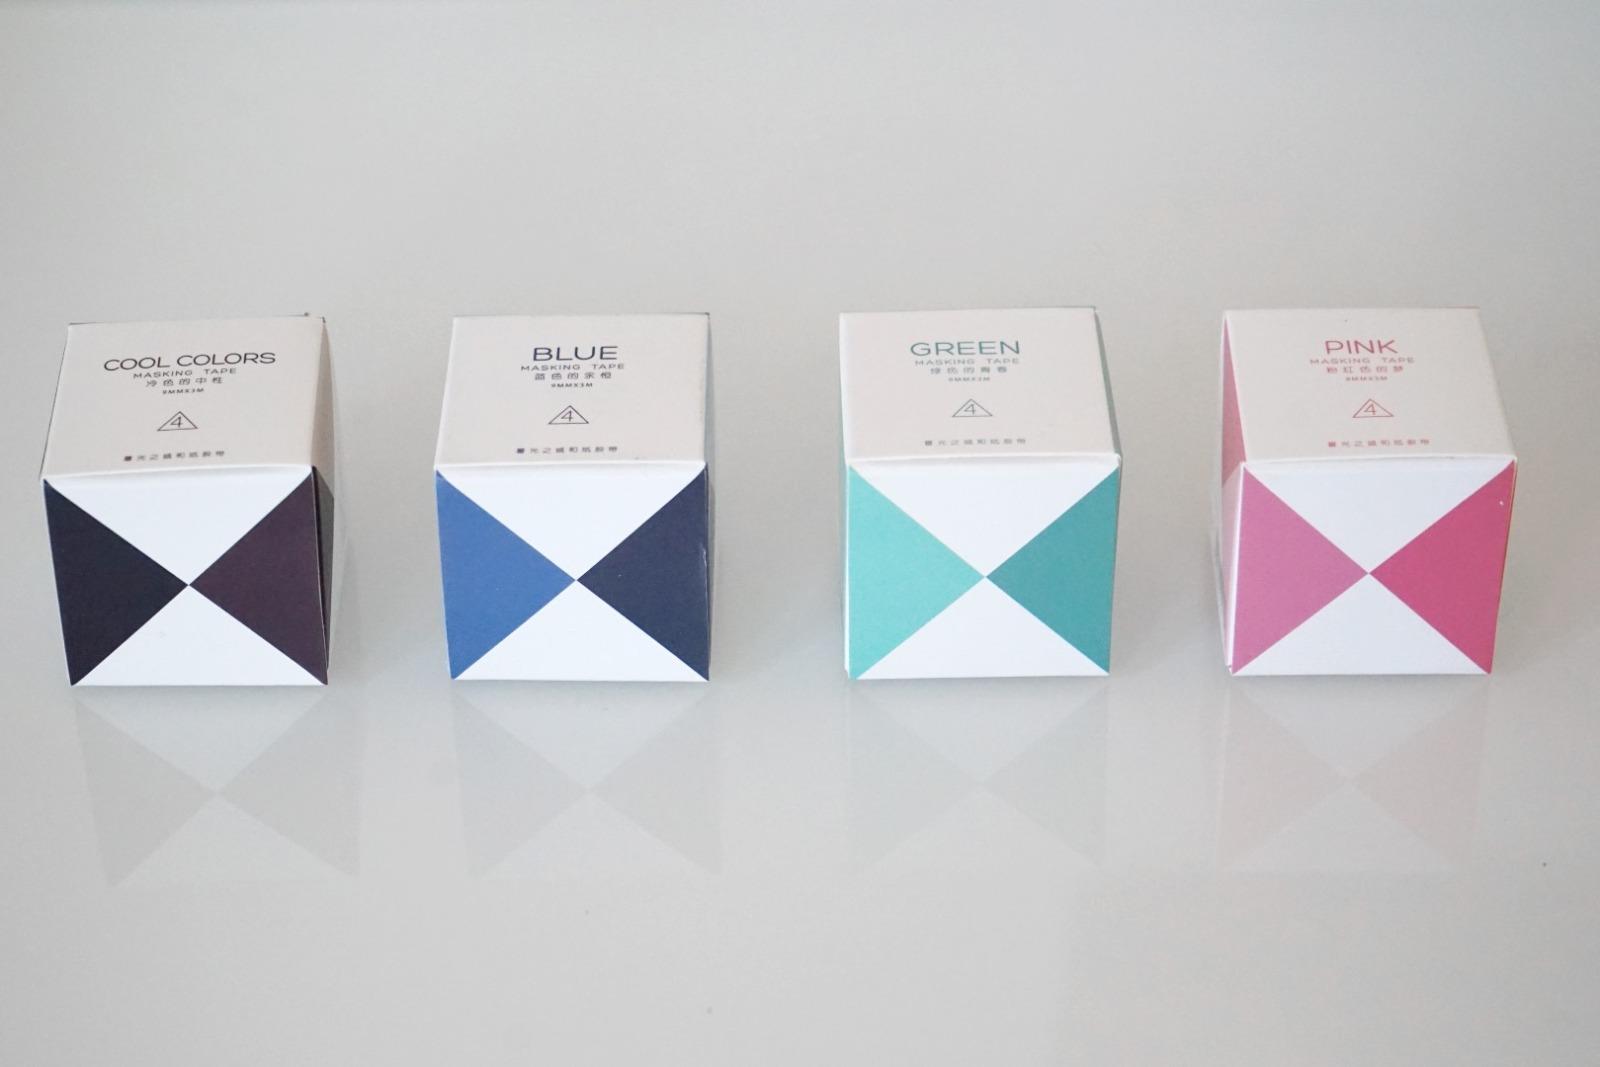 Klebeband Washi Tape Cool Colors 2